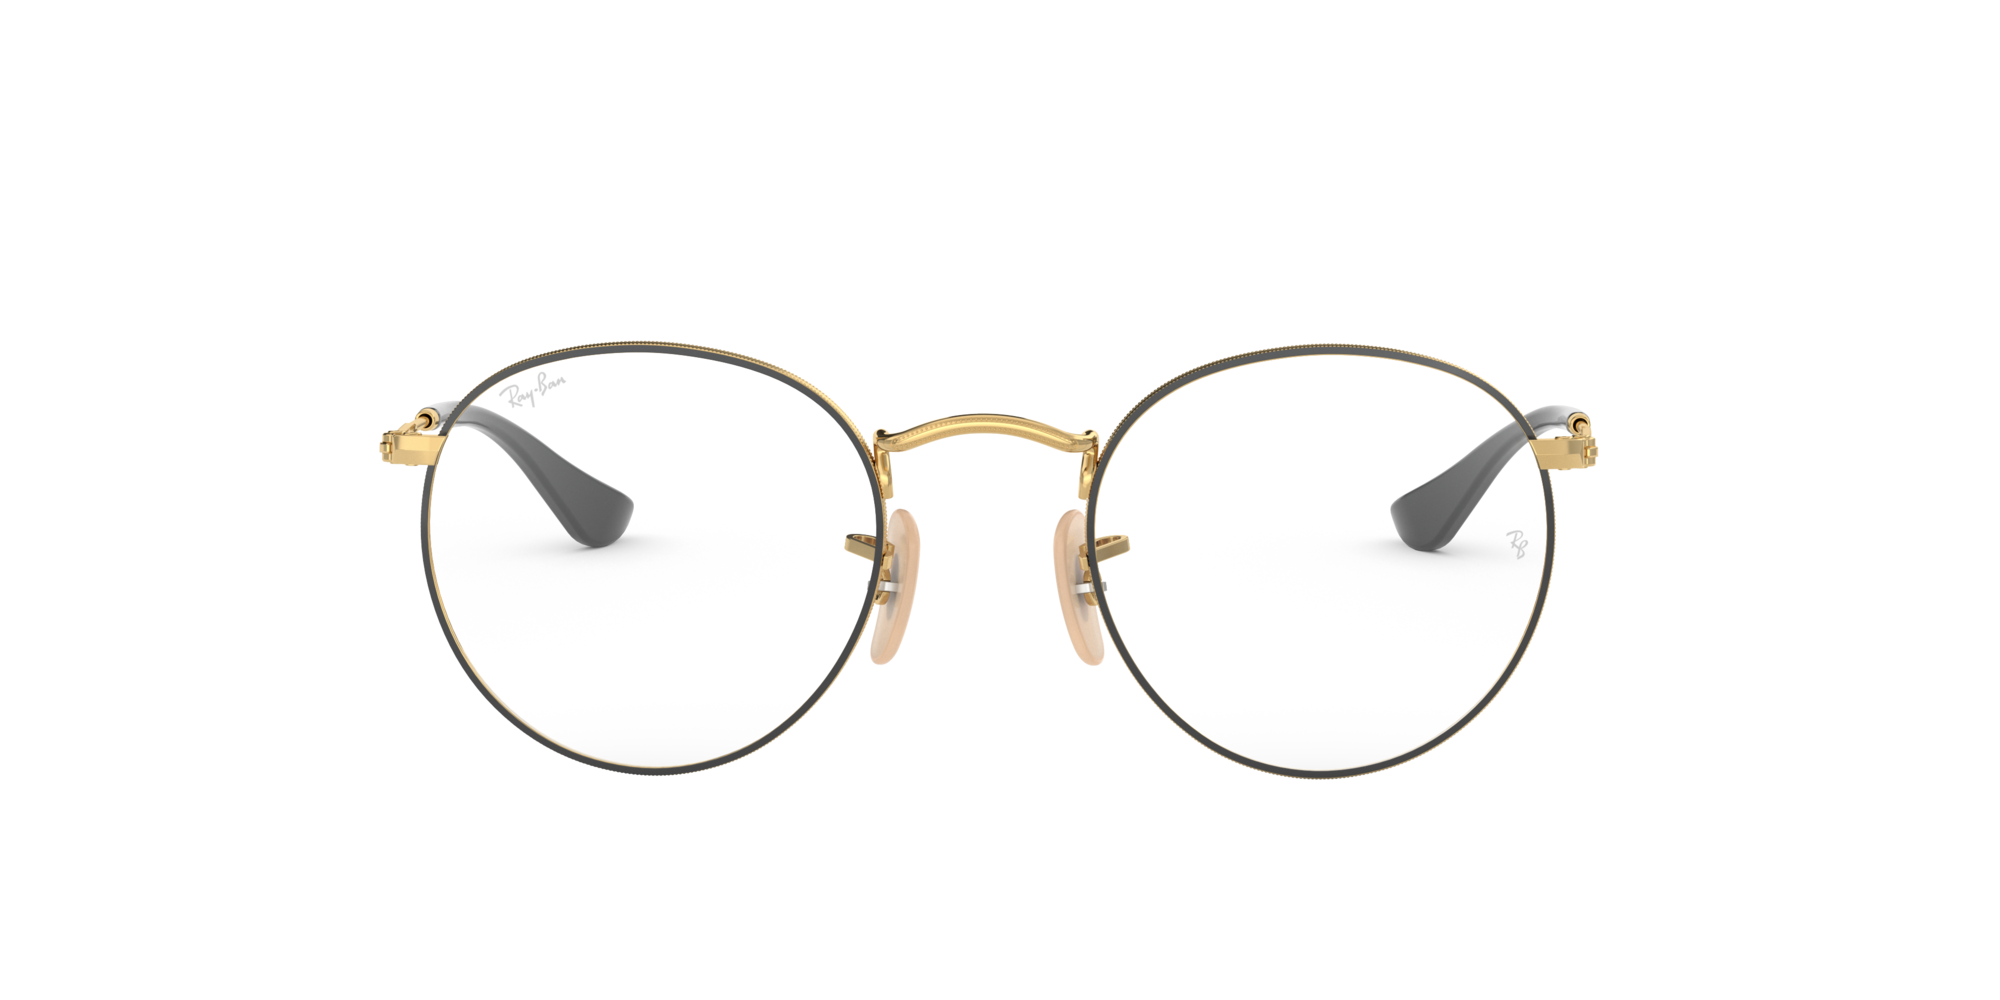 Image for RX3447V ROUND METAL from LensCrafters   Glasses, Prescription Glasses Online, Eyewear